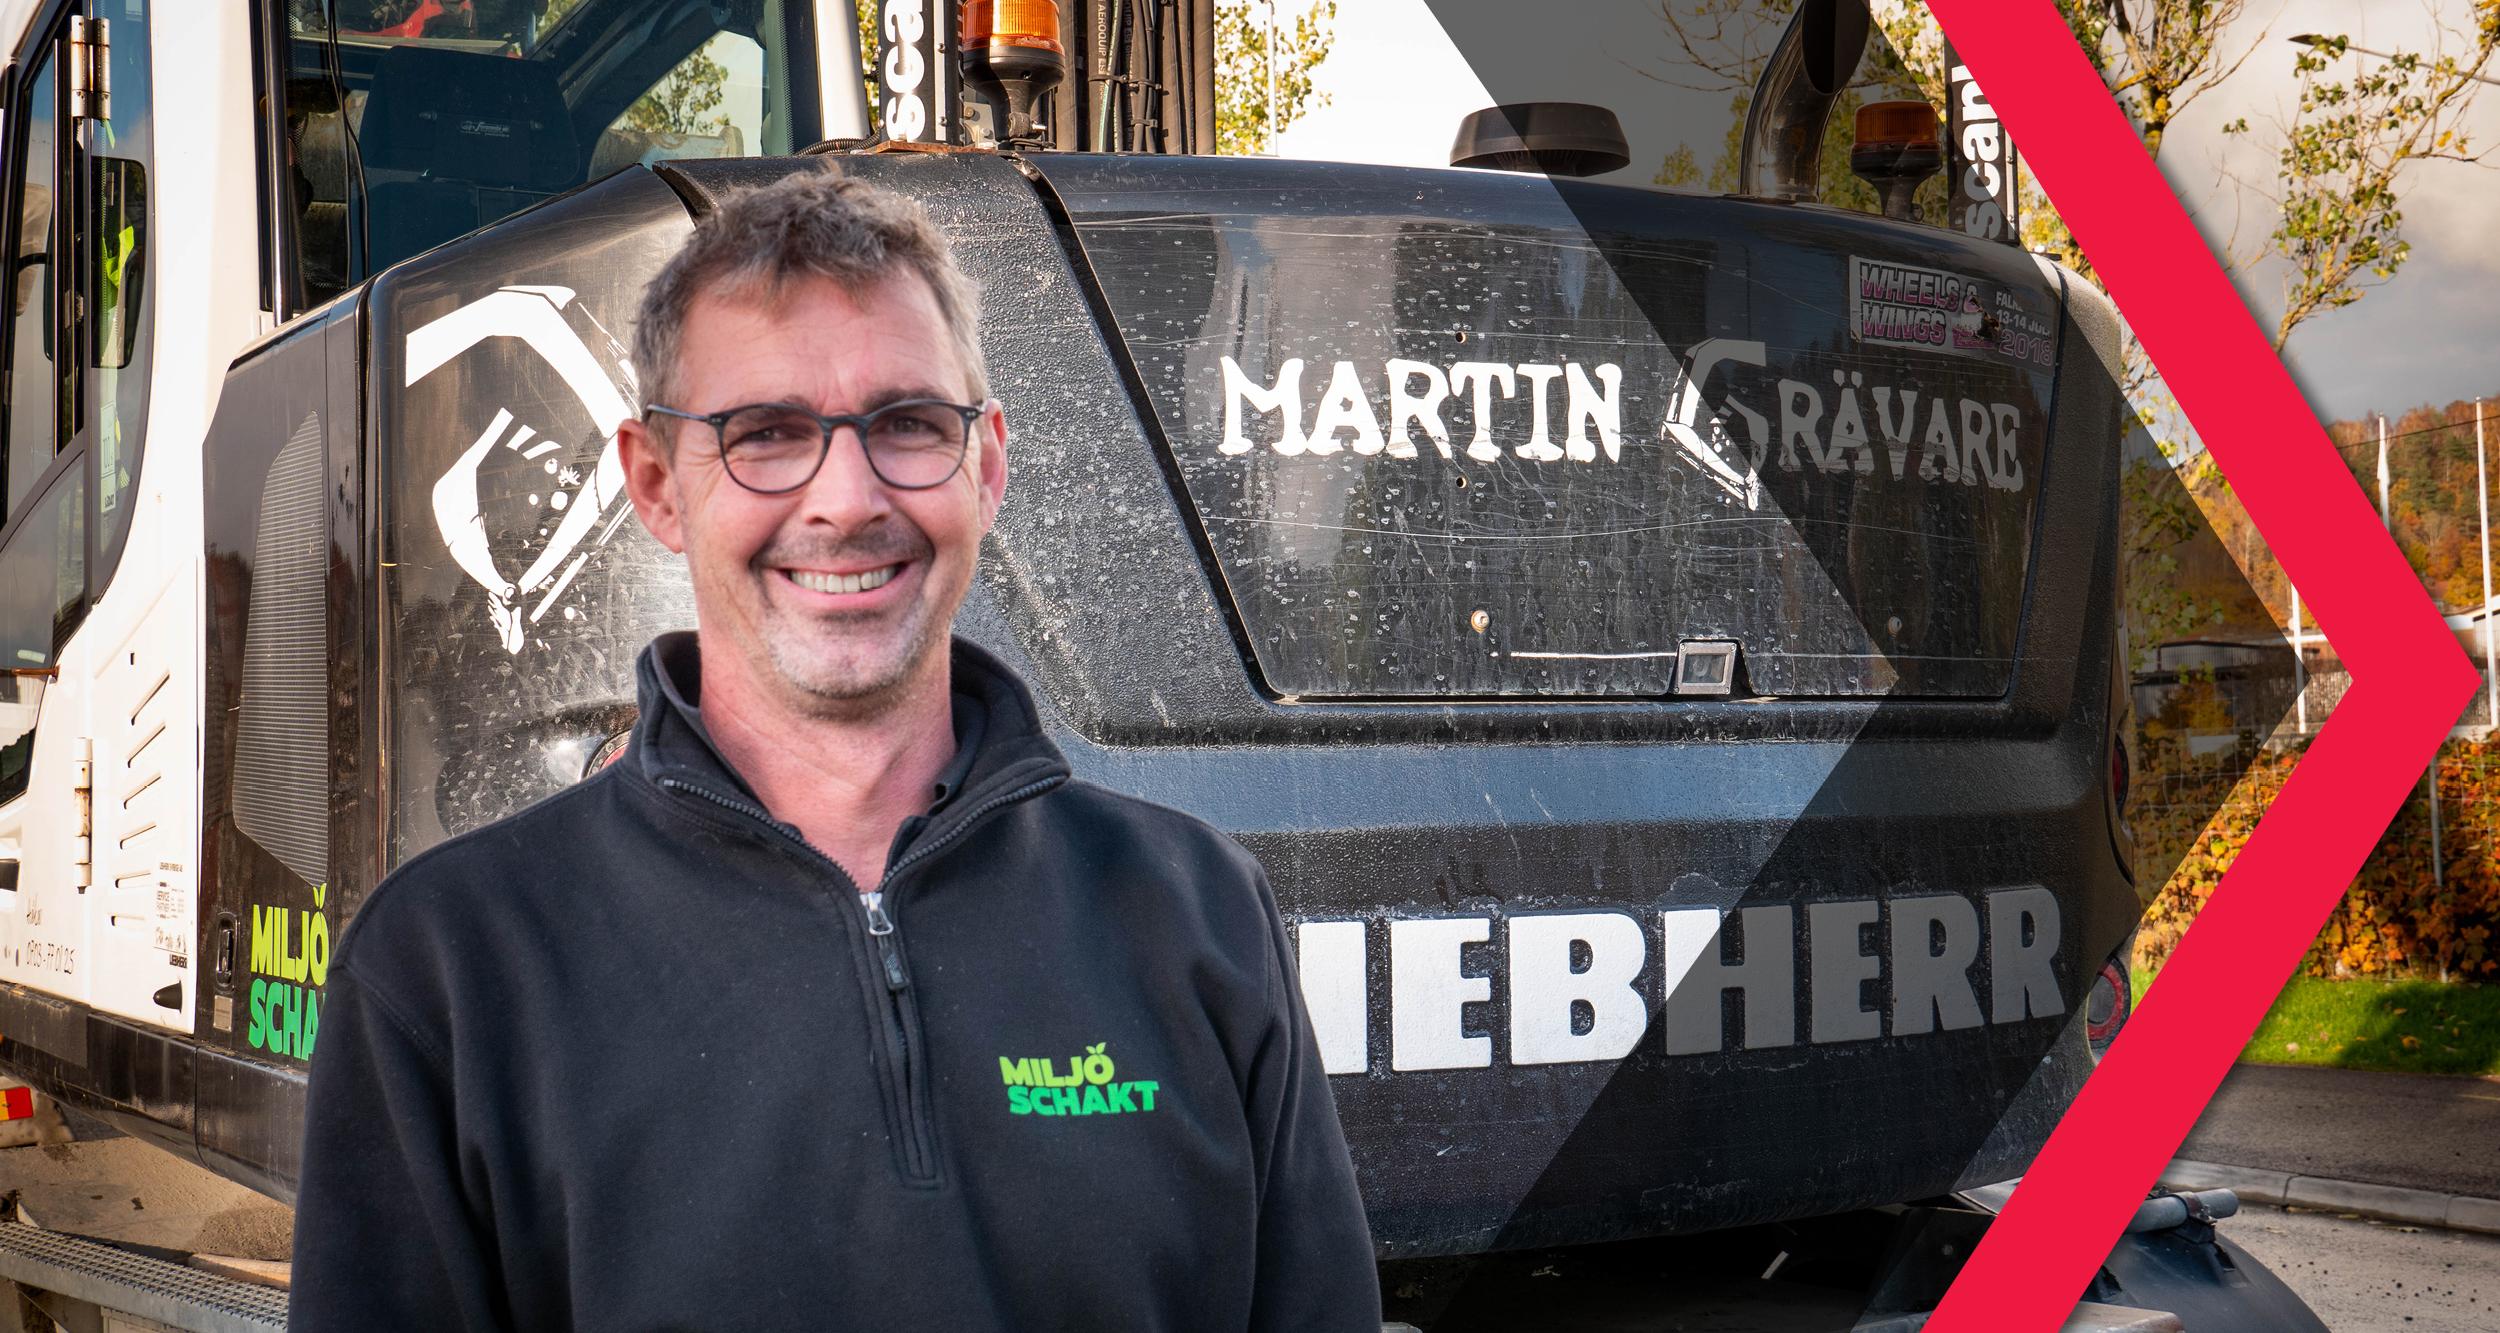 Martin grävare